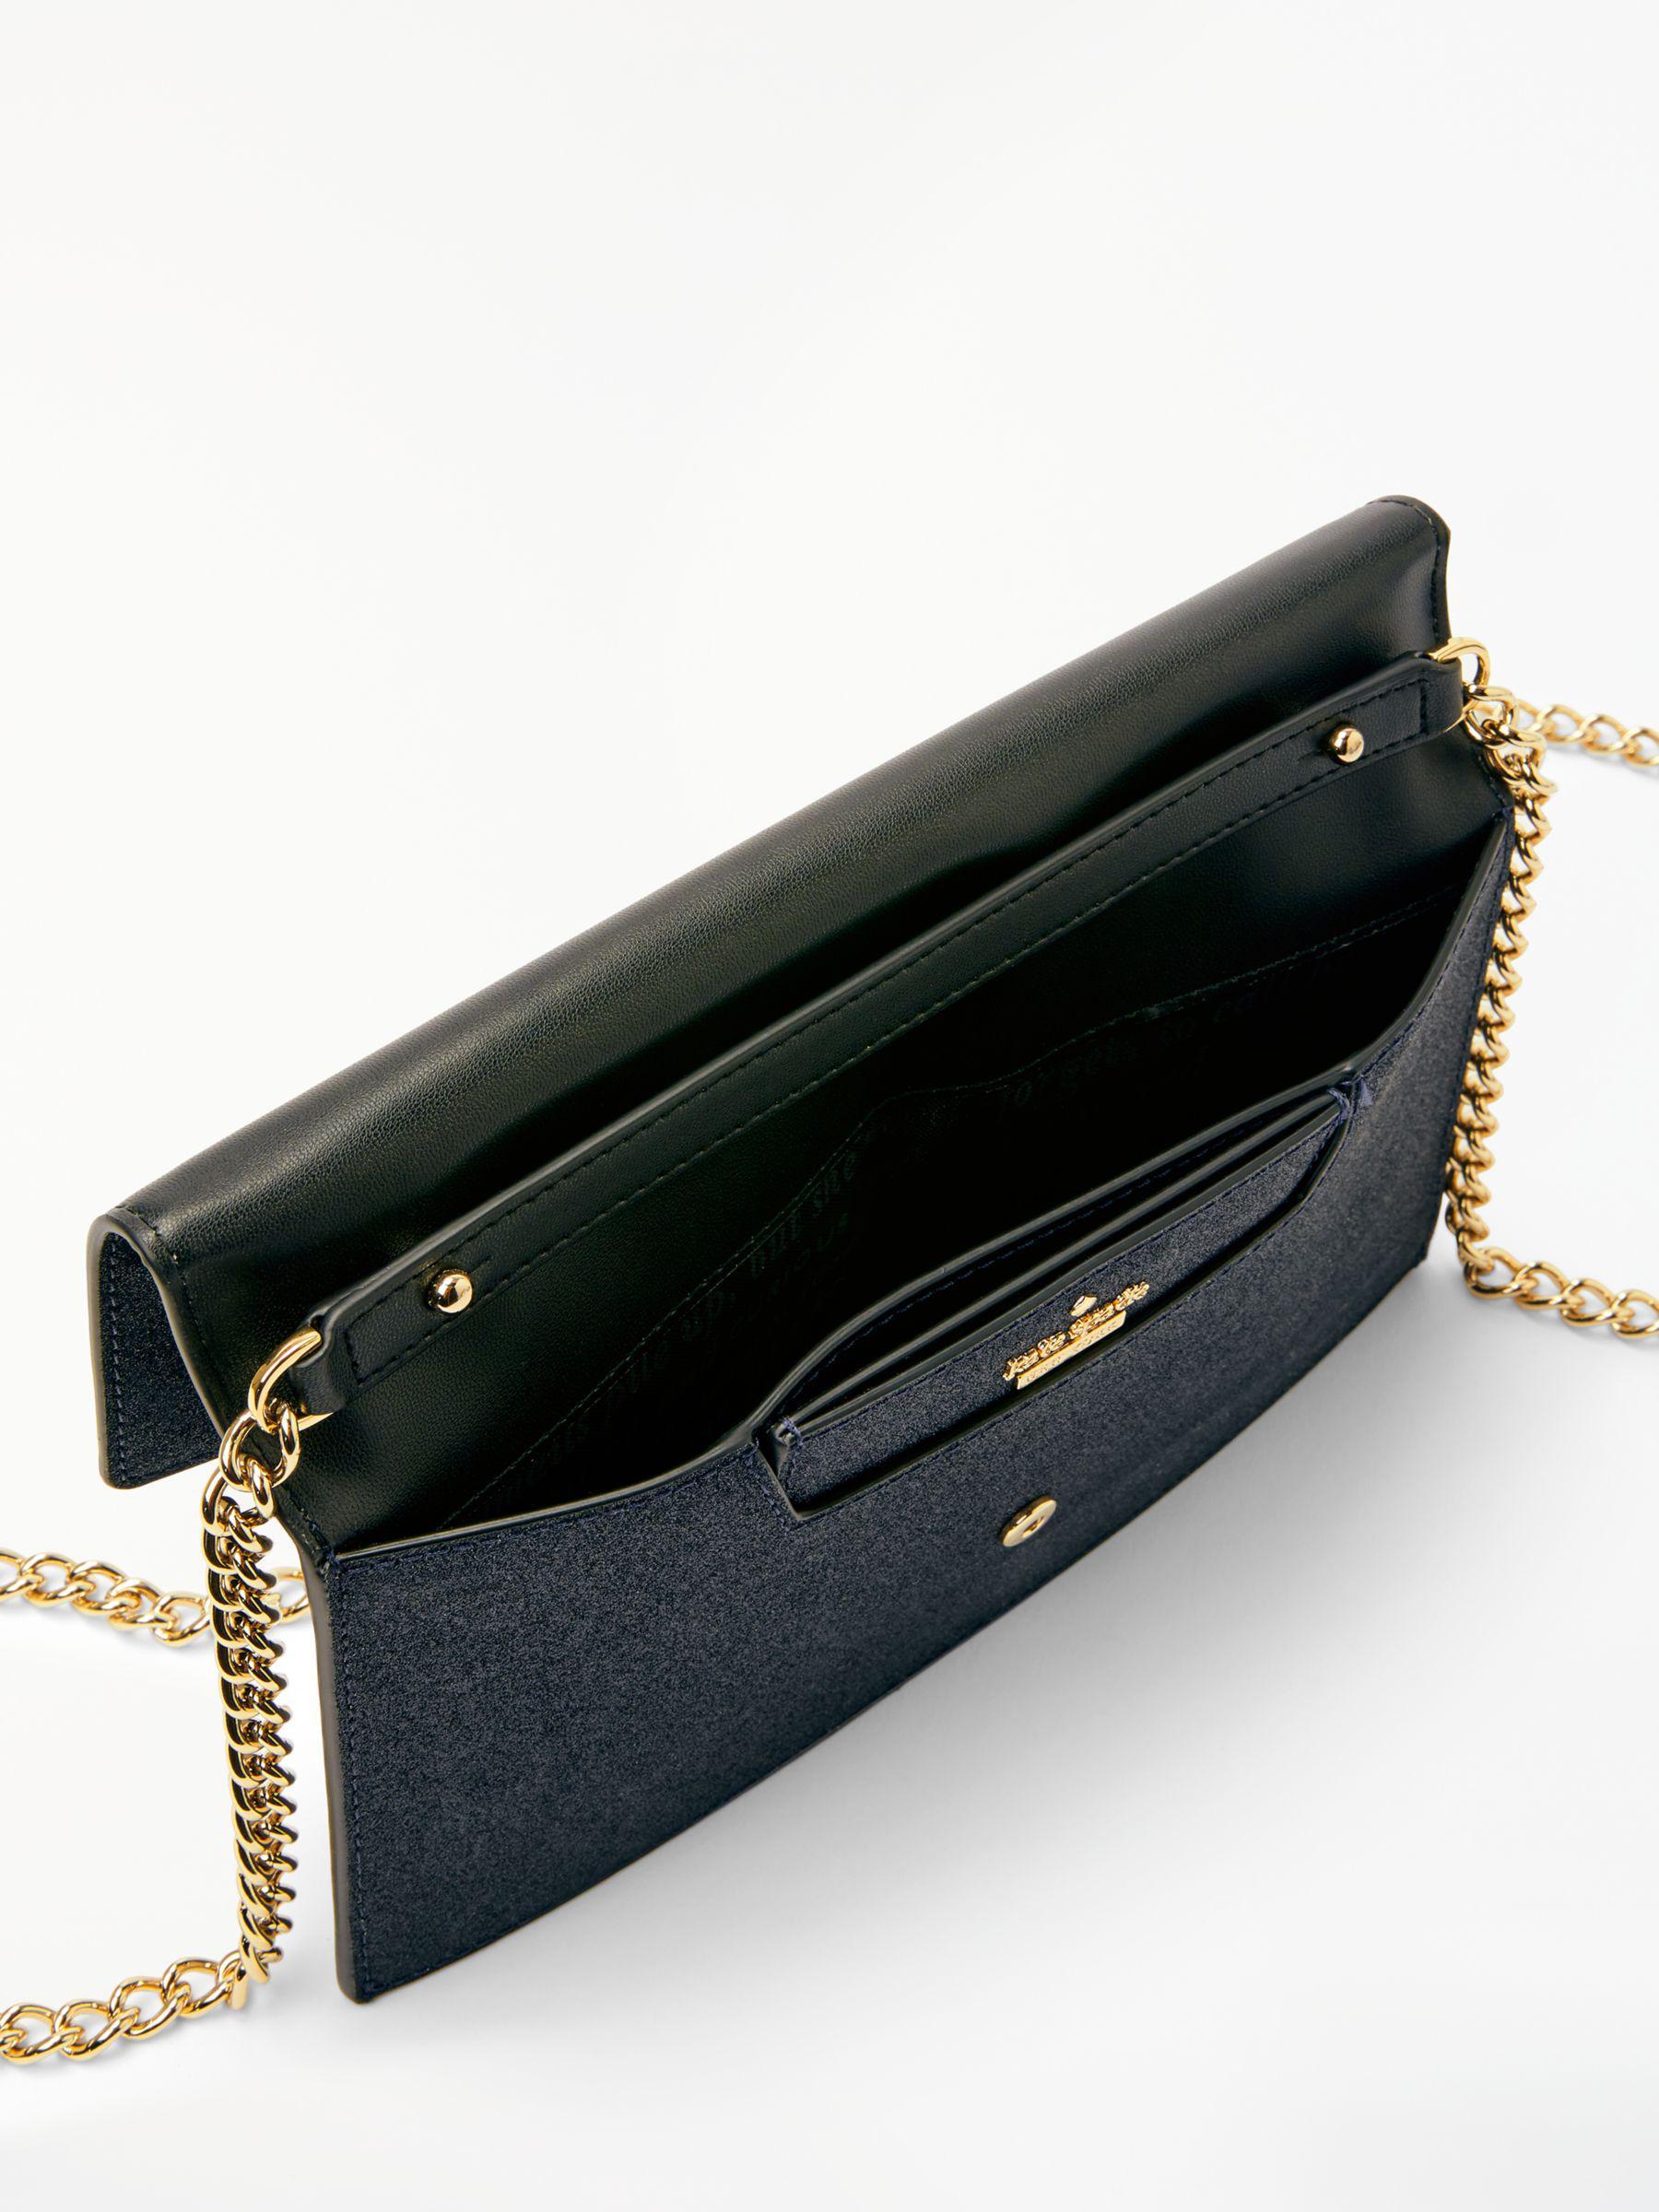 de4cb99ce5 Kate Spade Burgess Court Brennan Leather Foldover Purse in Blue - Lyst